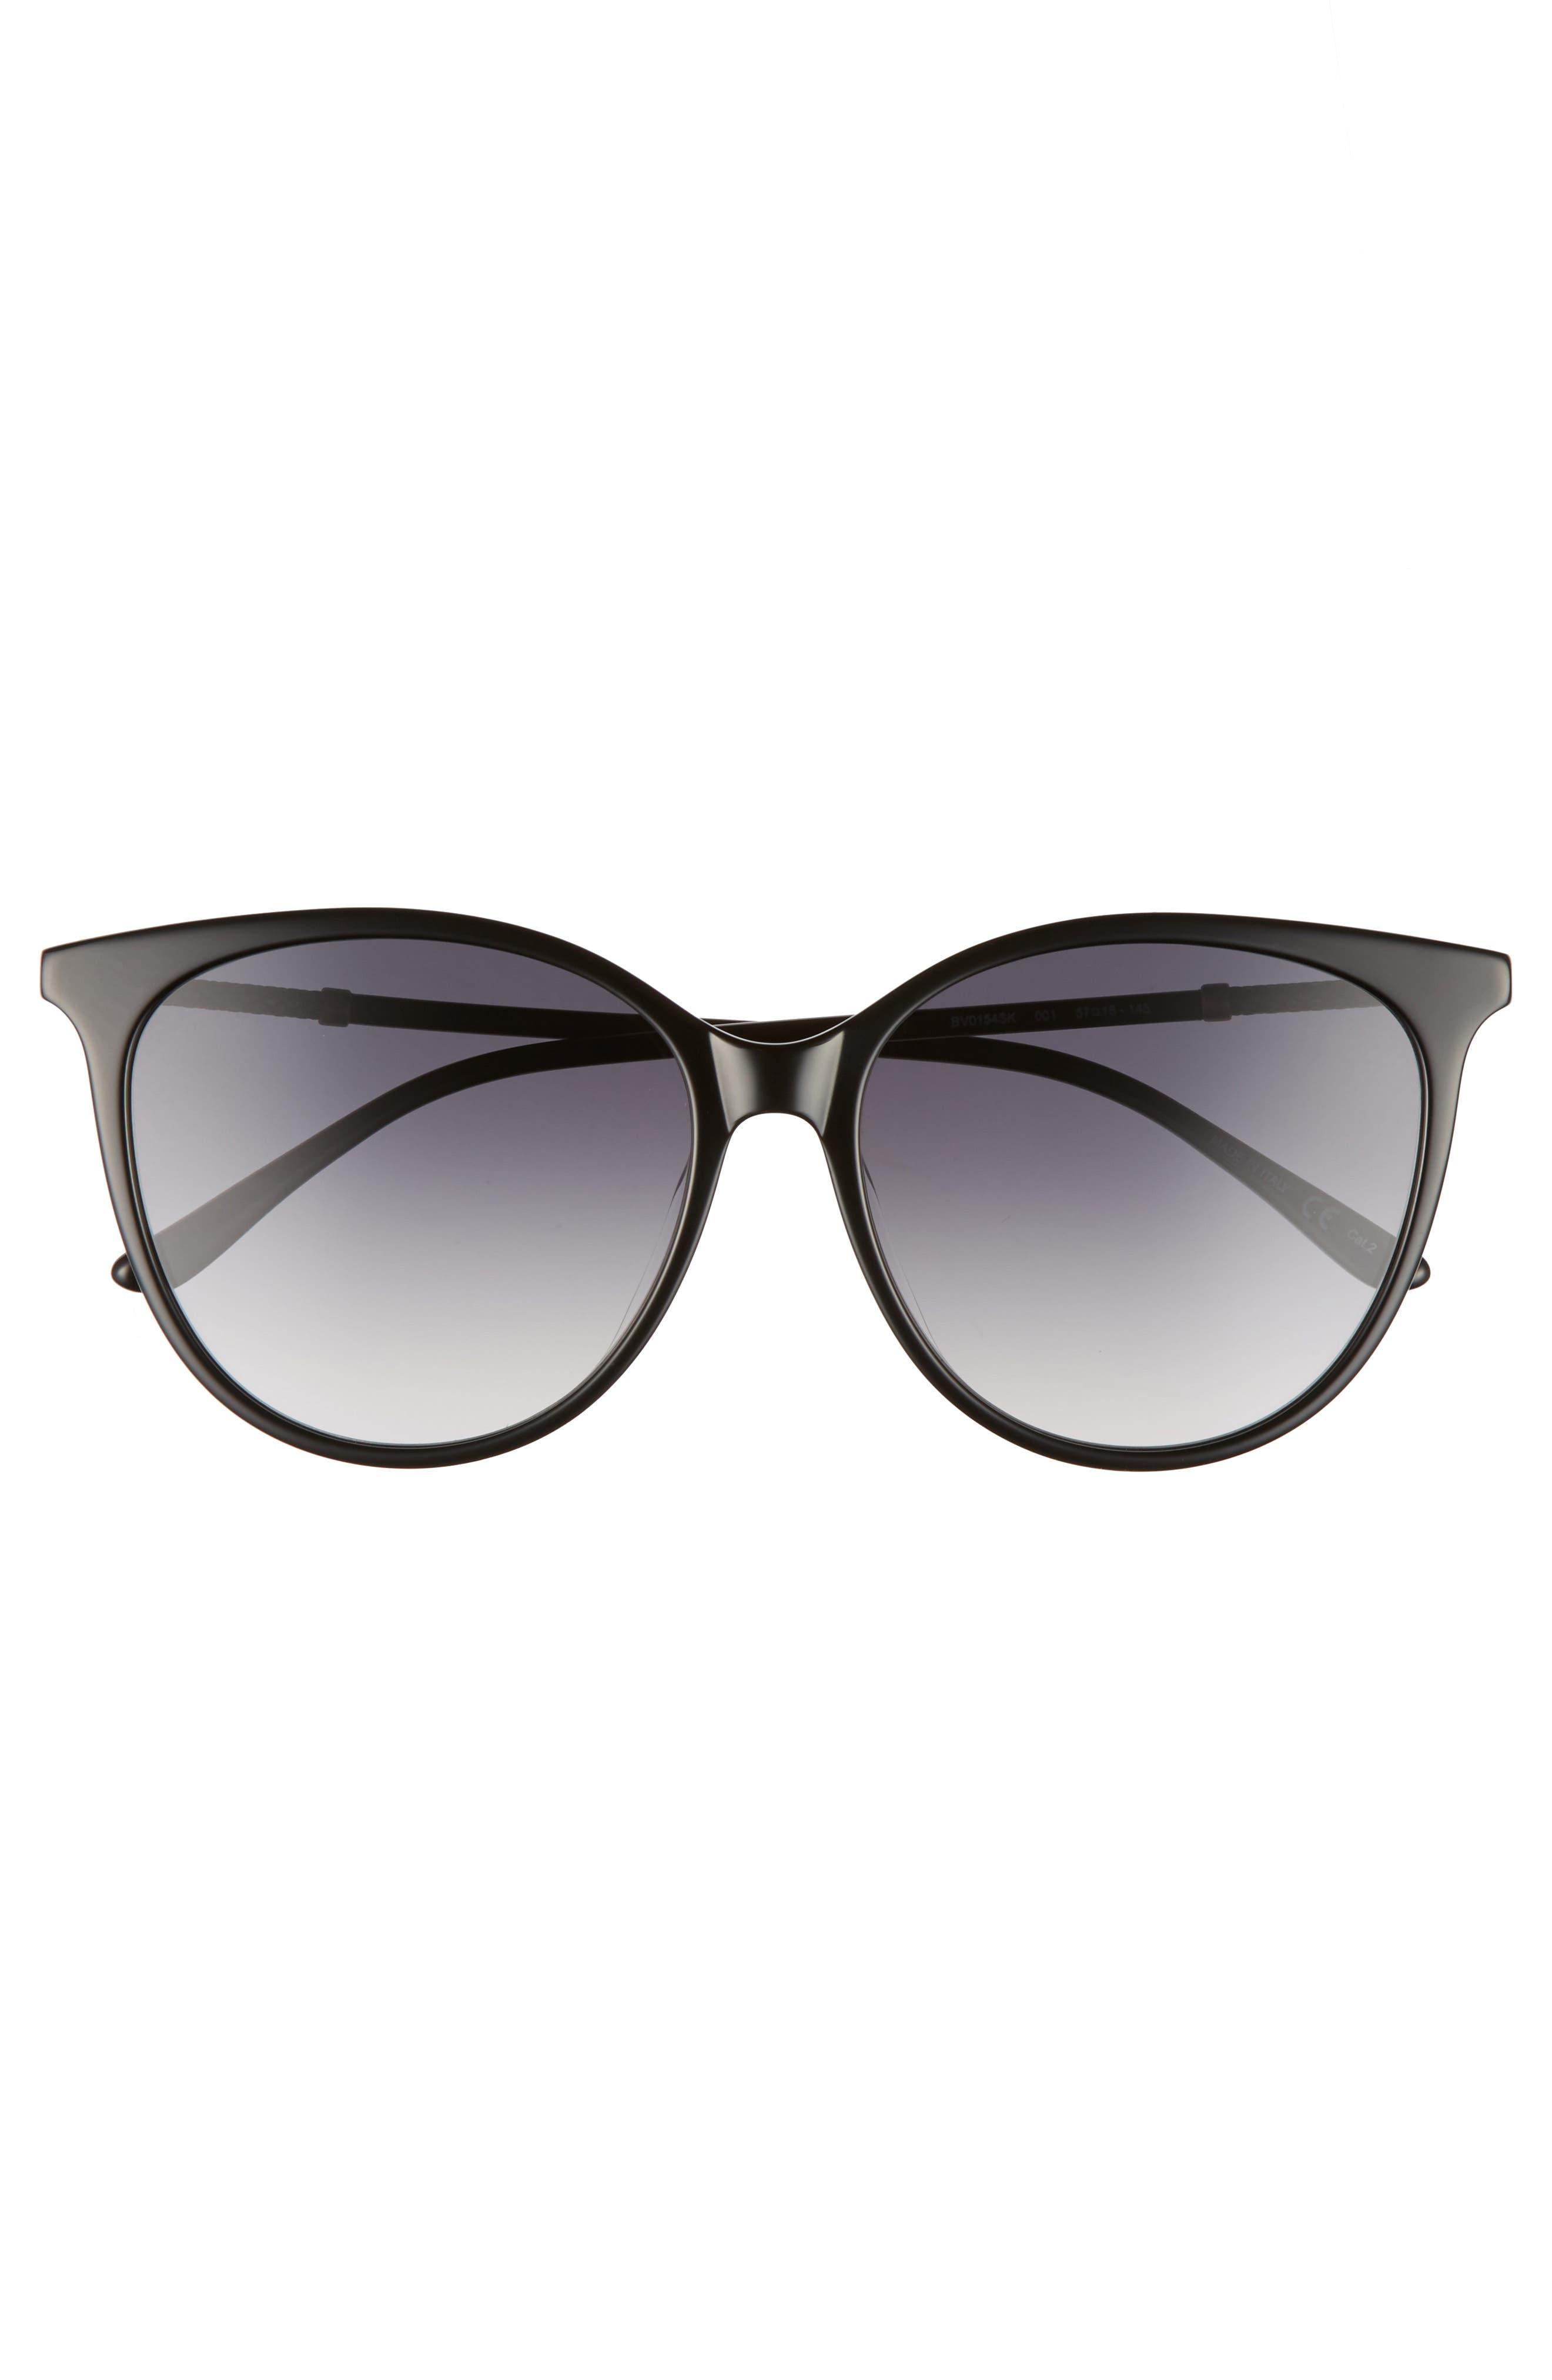 57mm Cat Eye Sunglasses,                             Alternate thumbnail 3, color,                             001